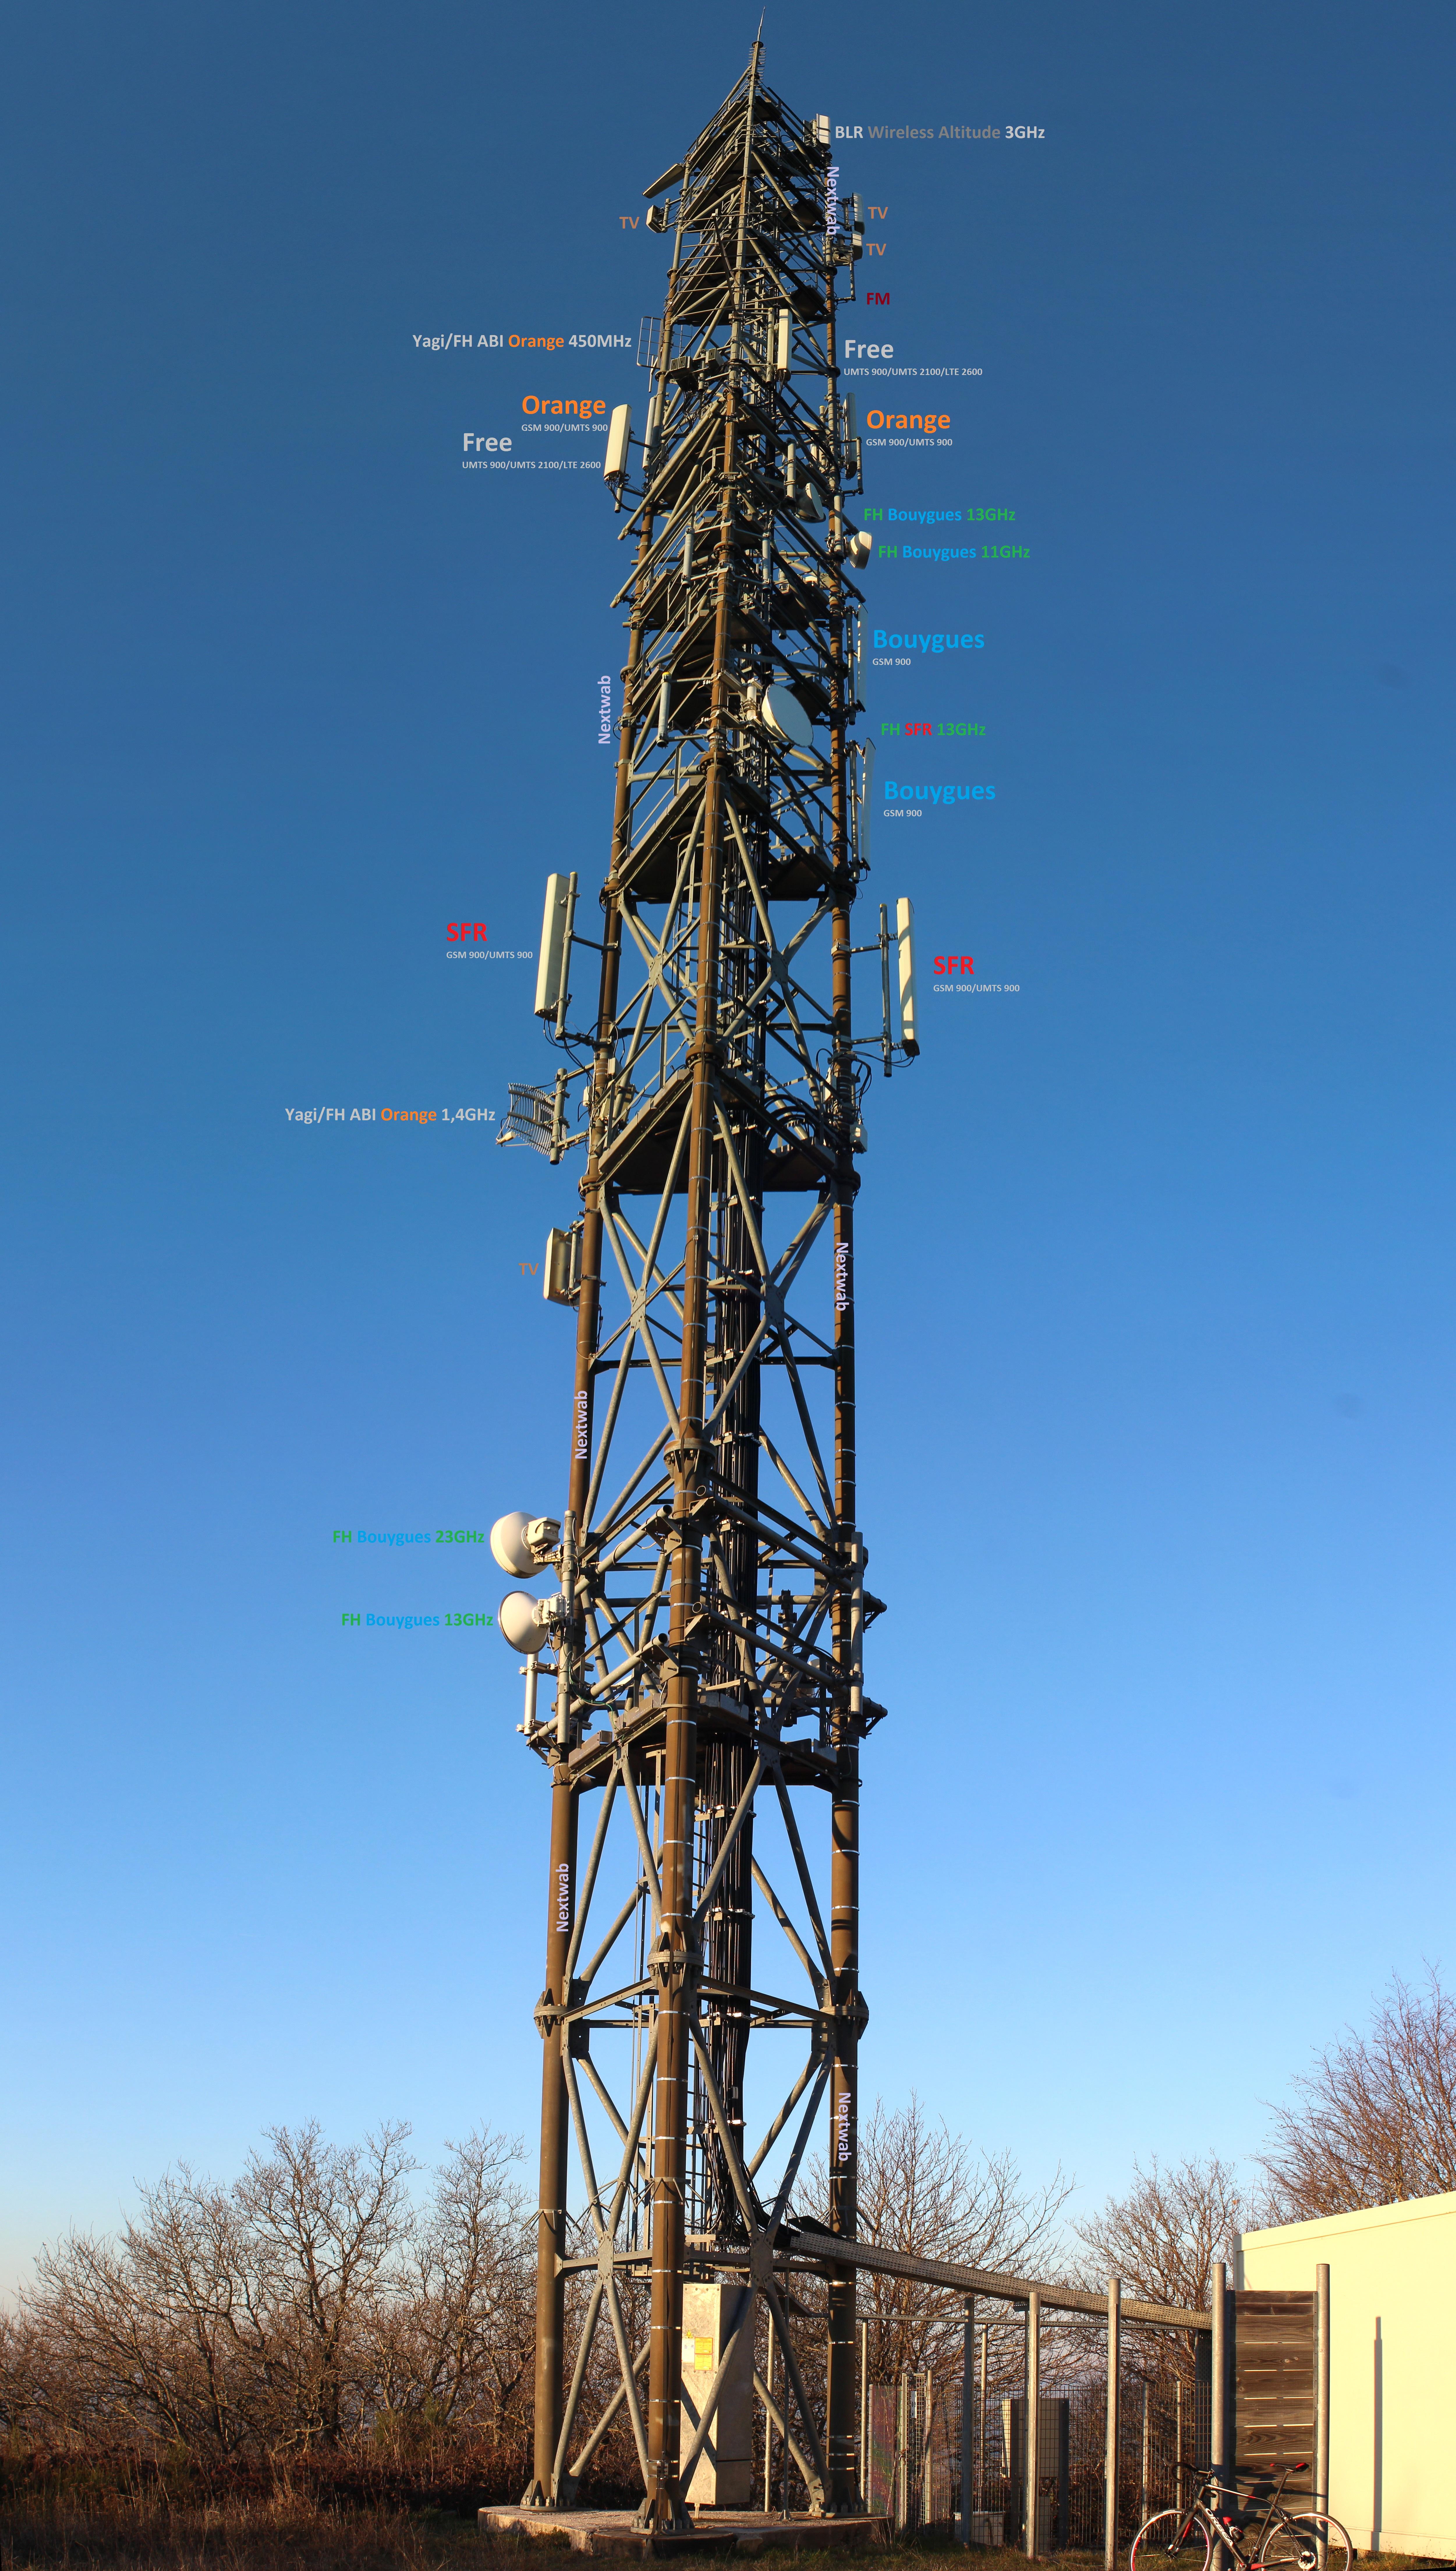 Antenne Relais - Orange - SFR - Bouygues - Free (4G, Wimax, TV, FM)